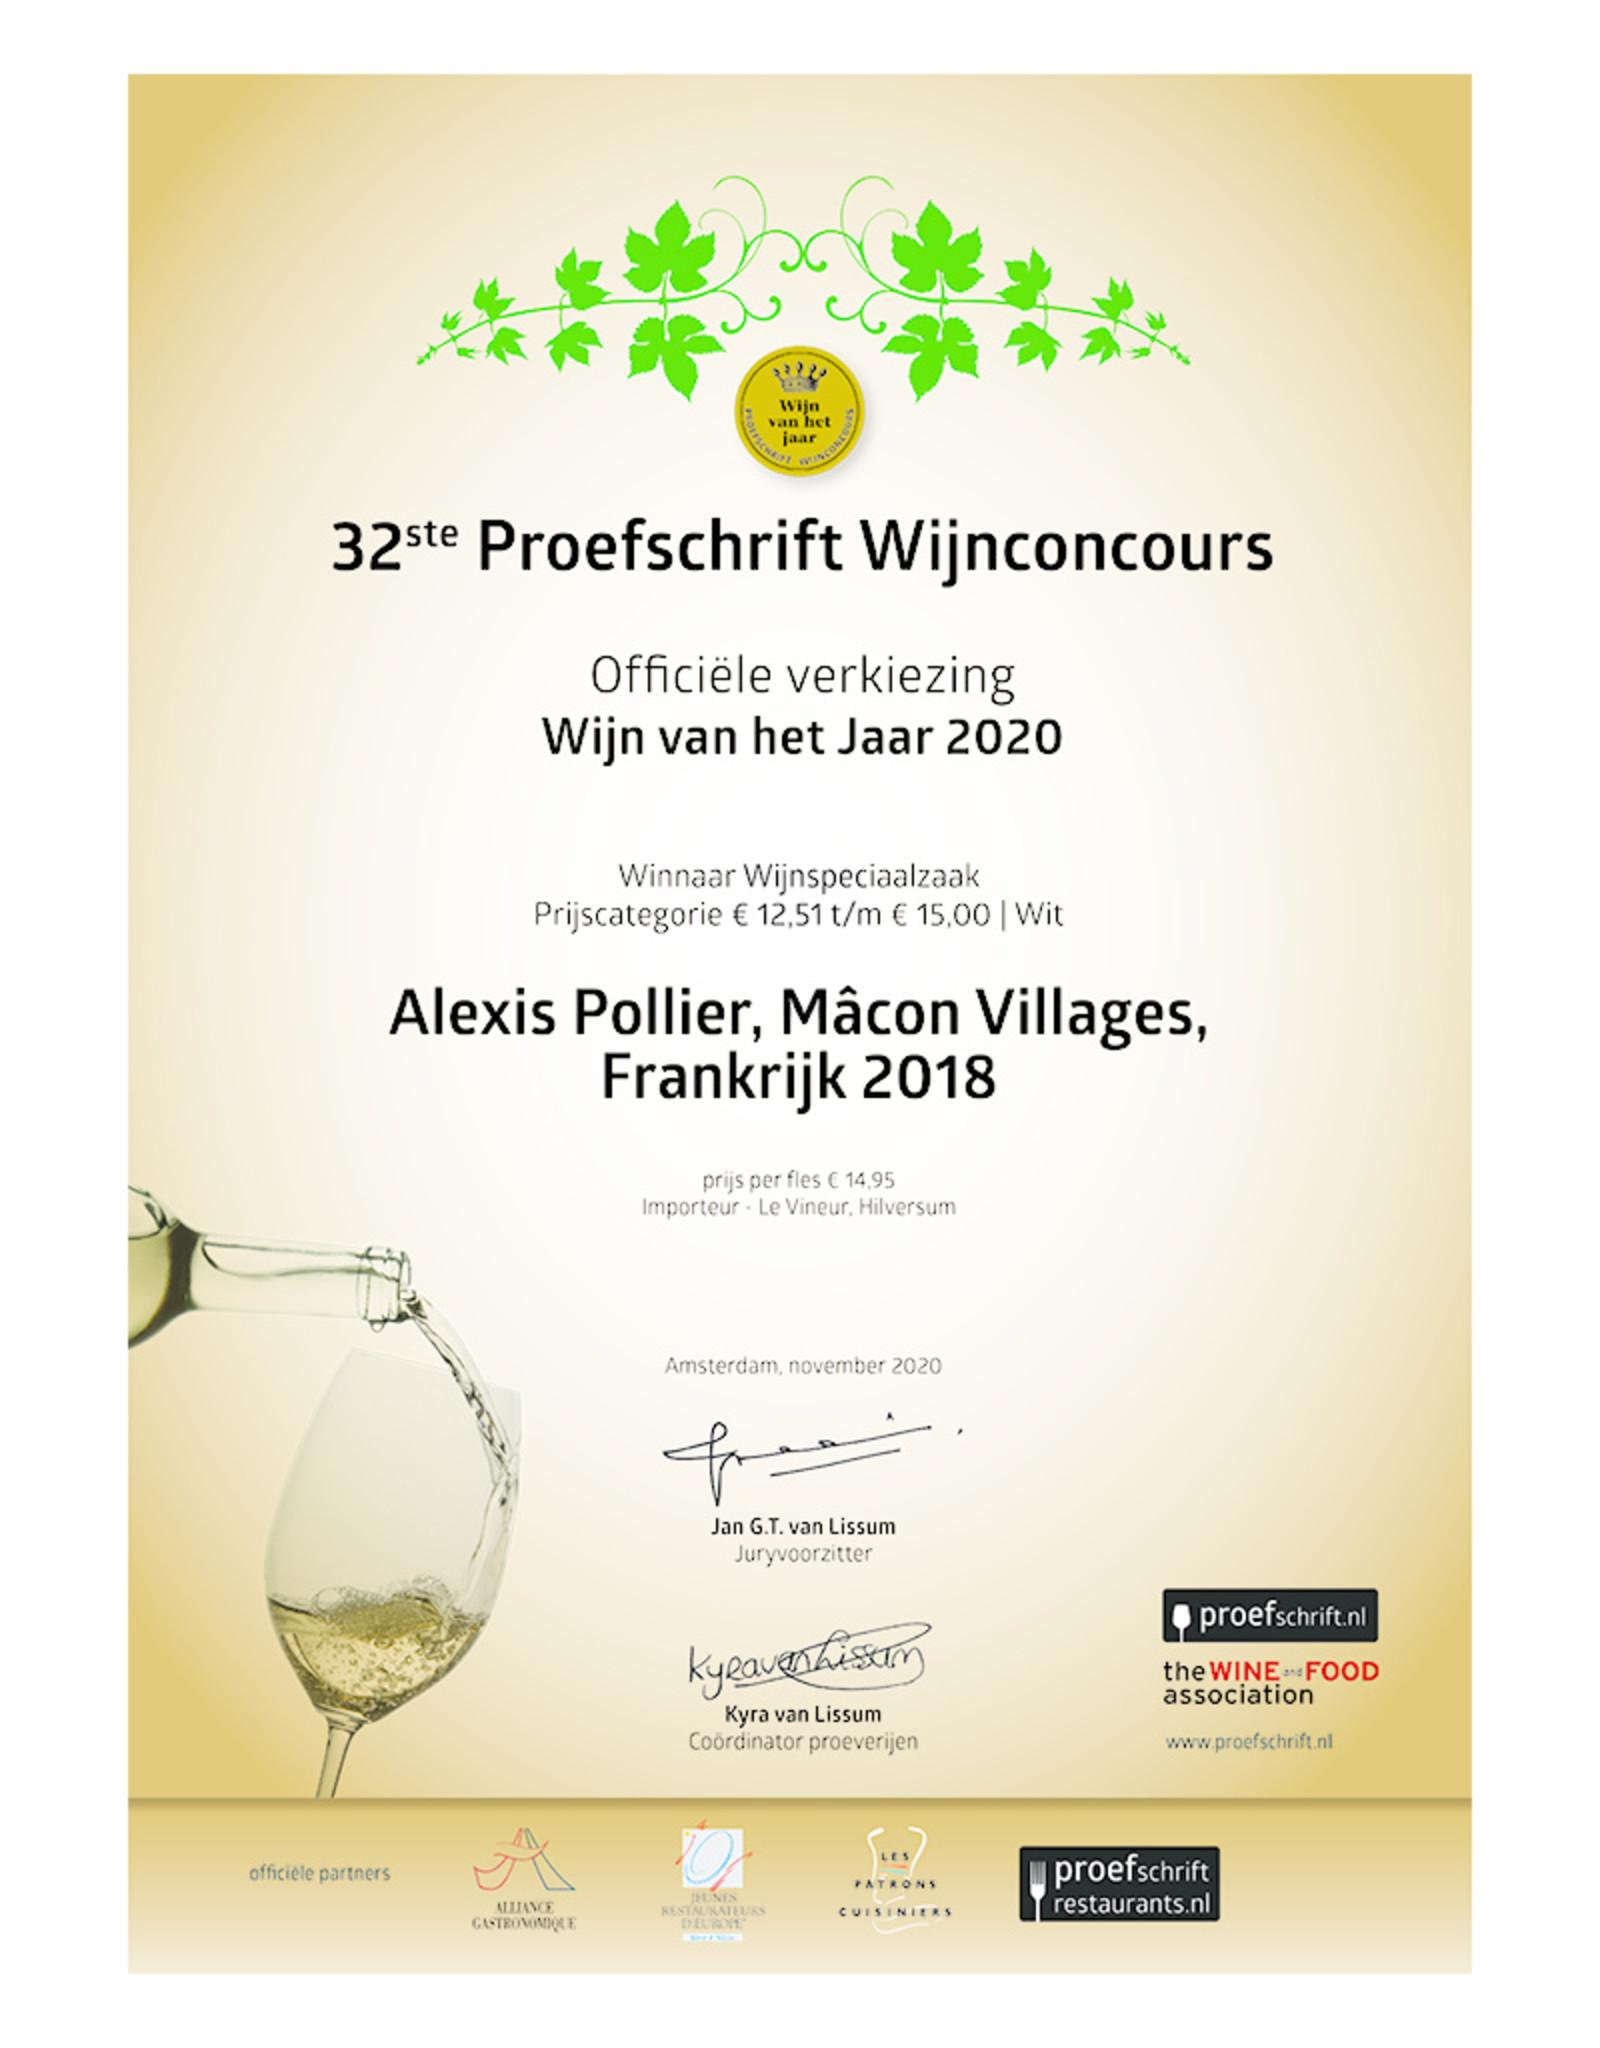 Alexis Pollier Macon Villages 2018